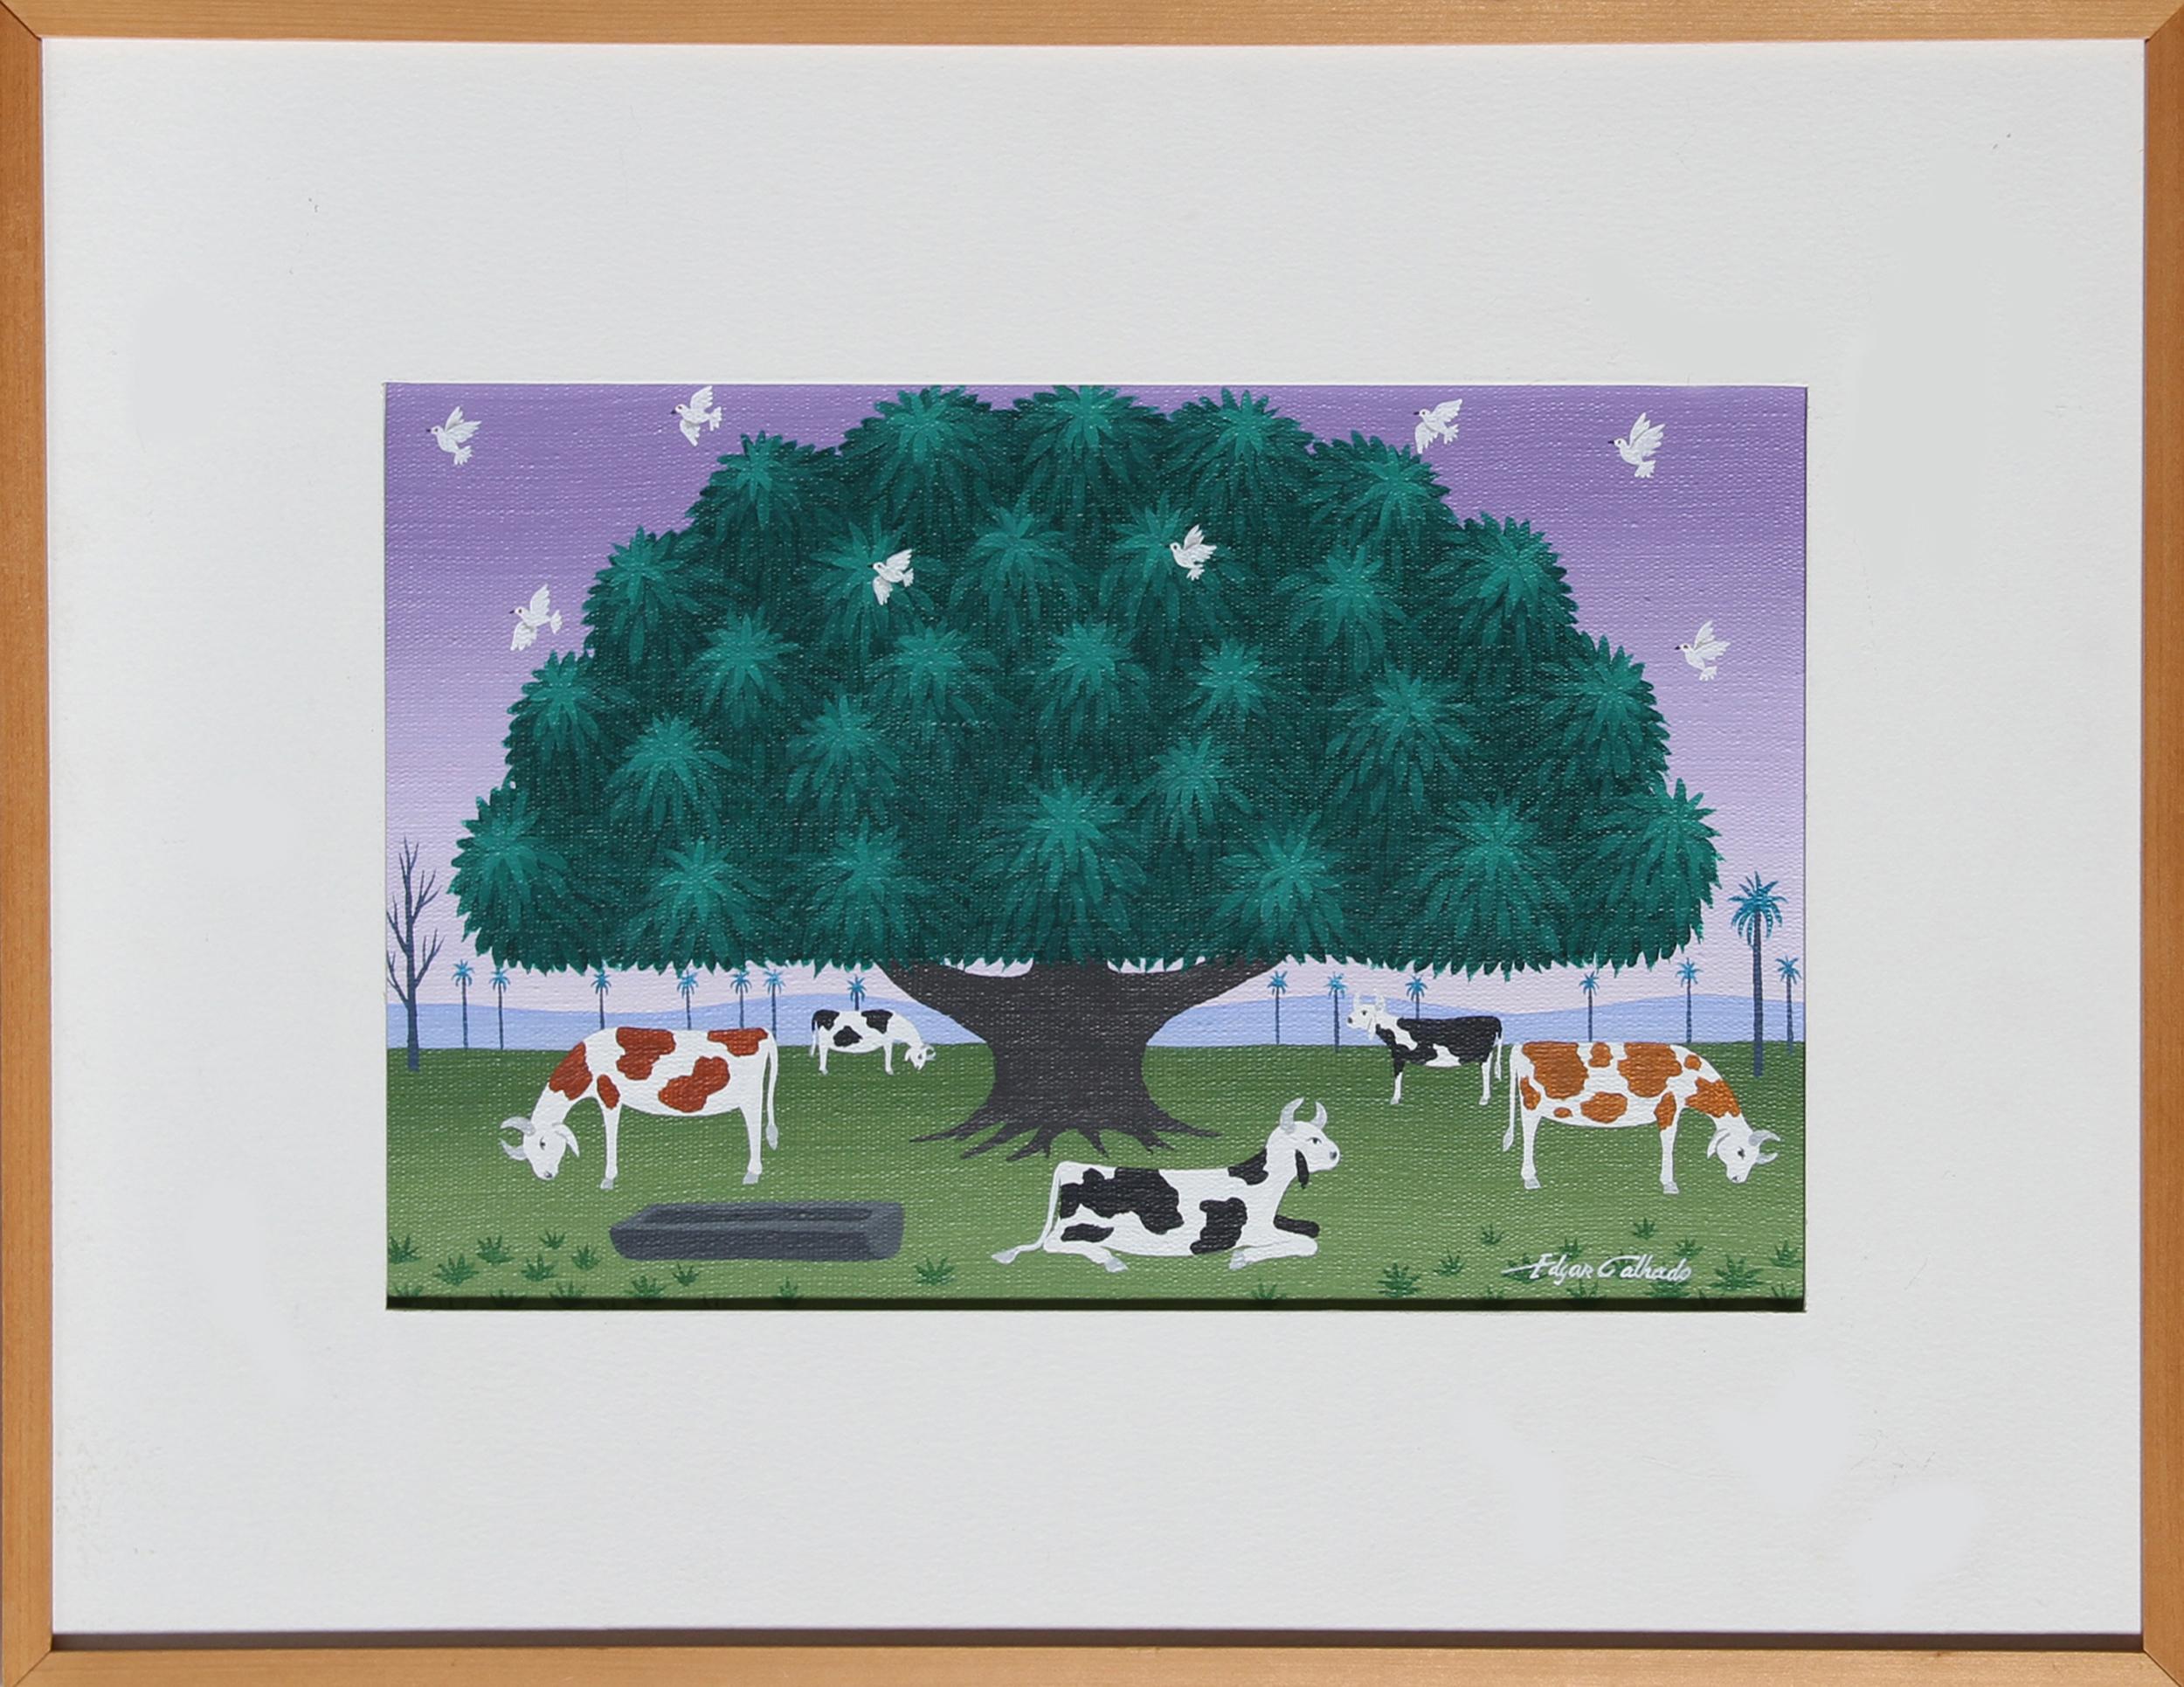 Edgar Calhado, Cows Under a Tree, Acrylic Painting